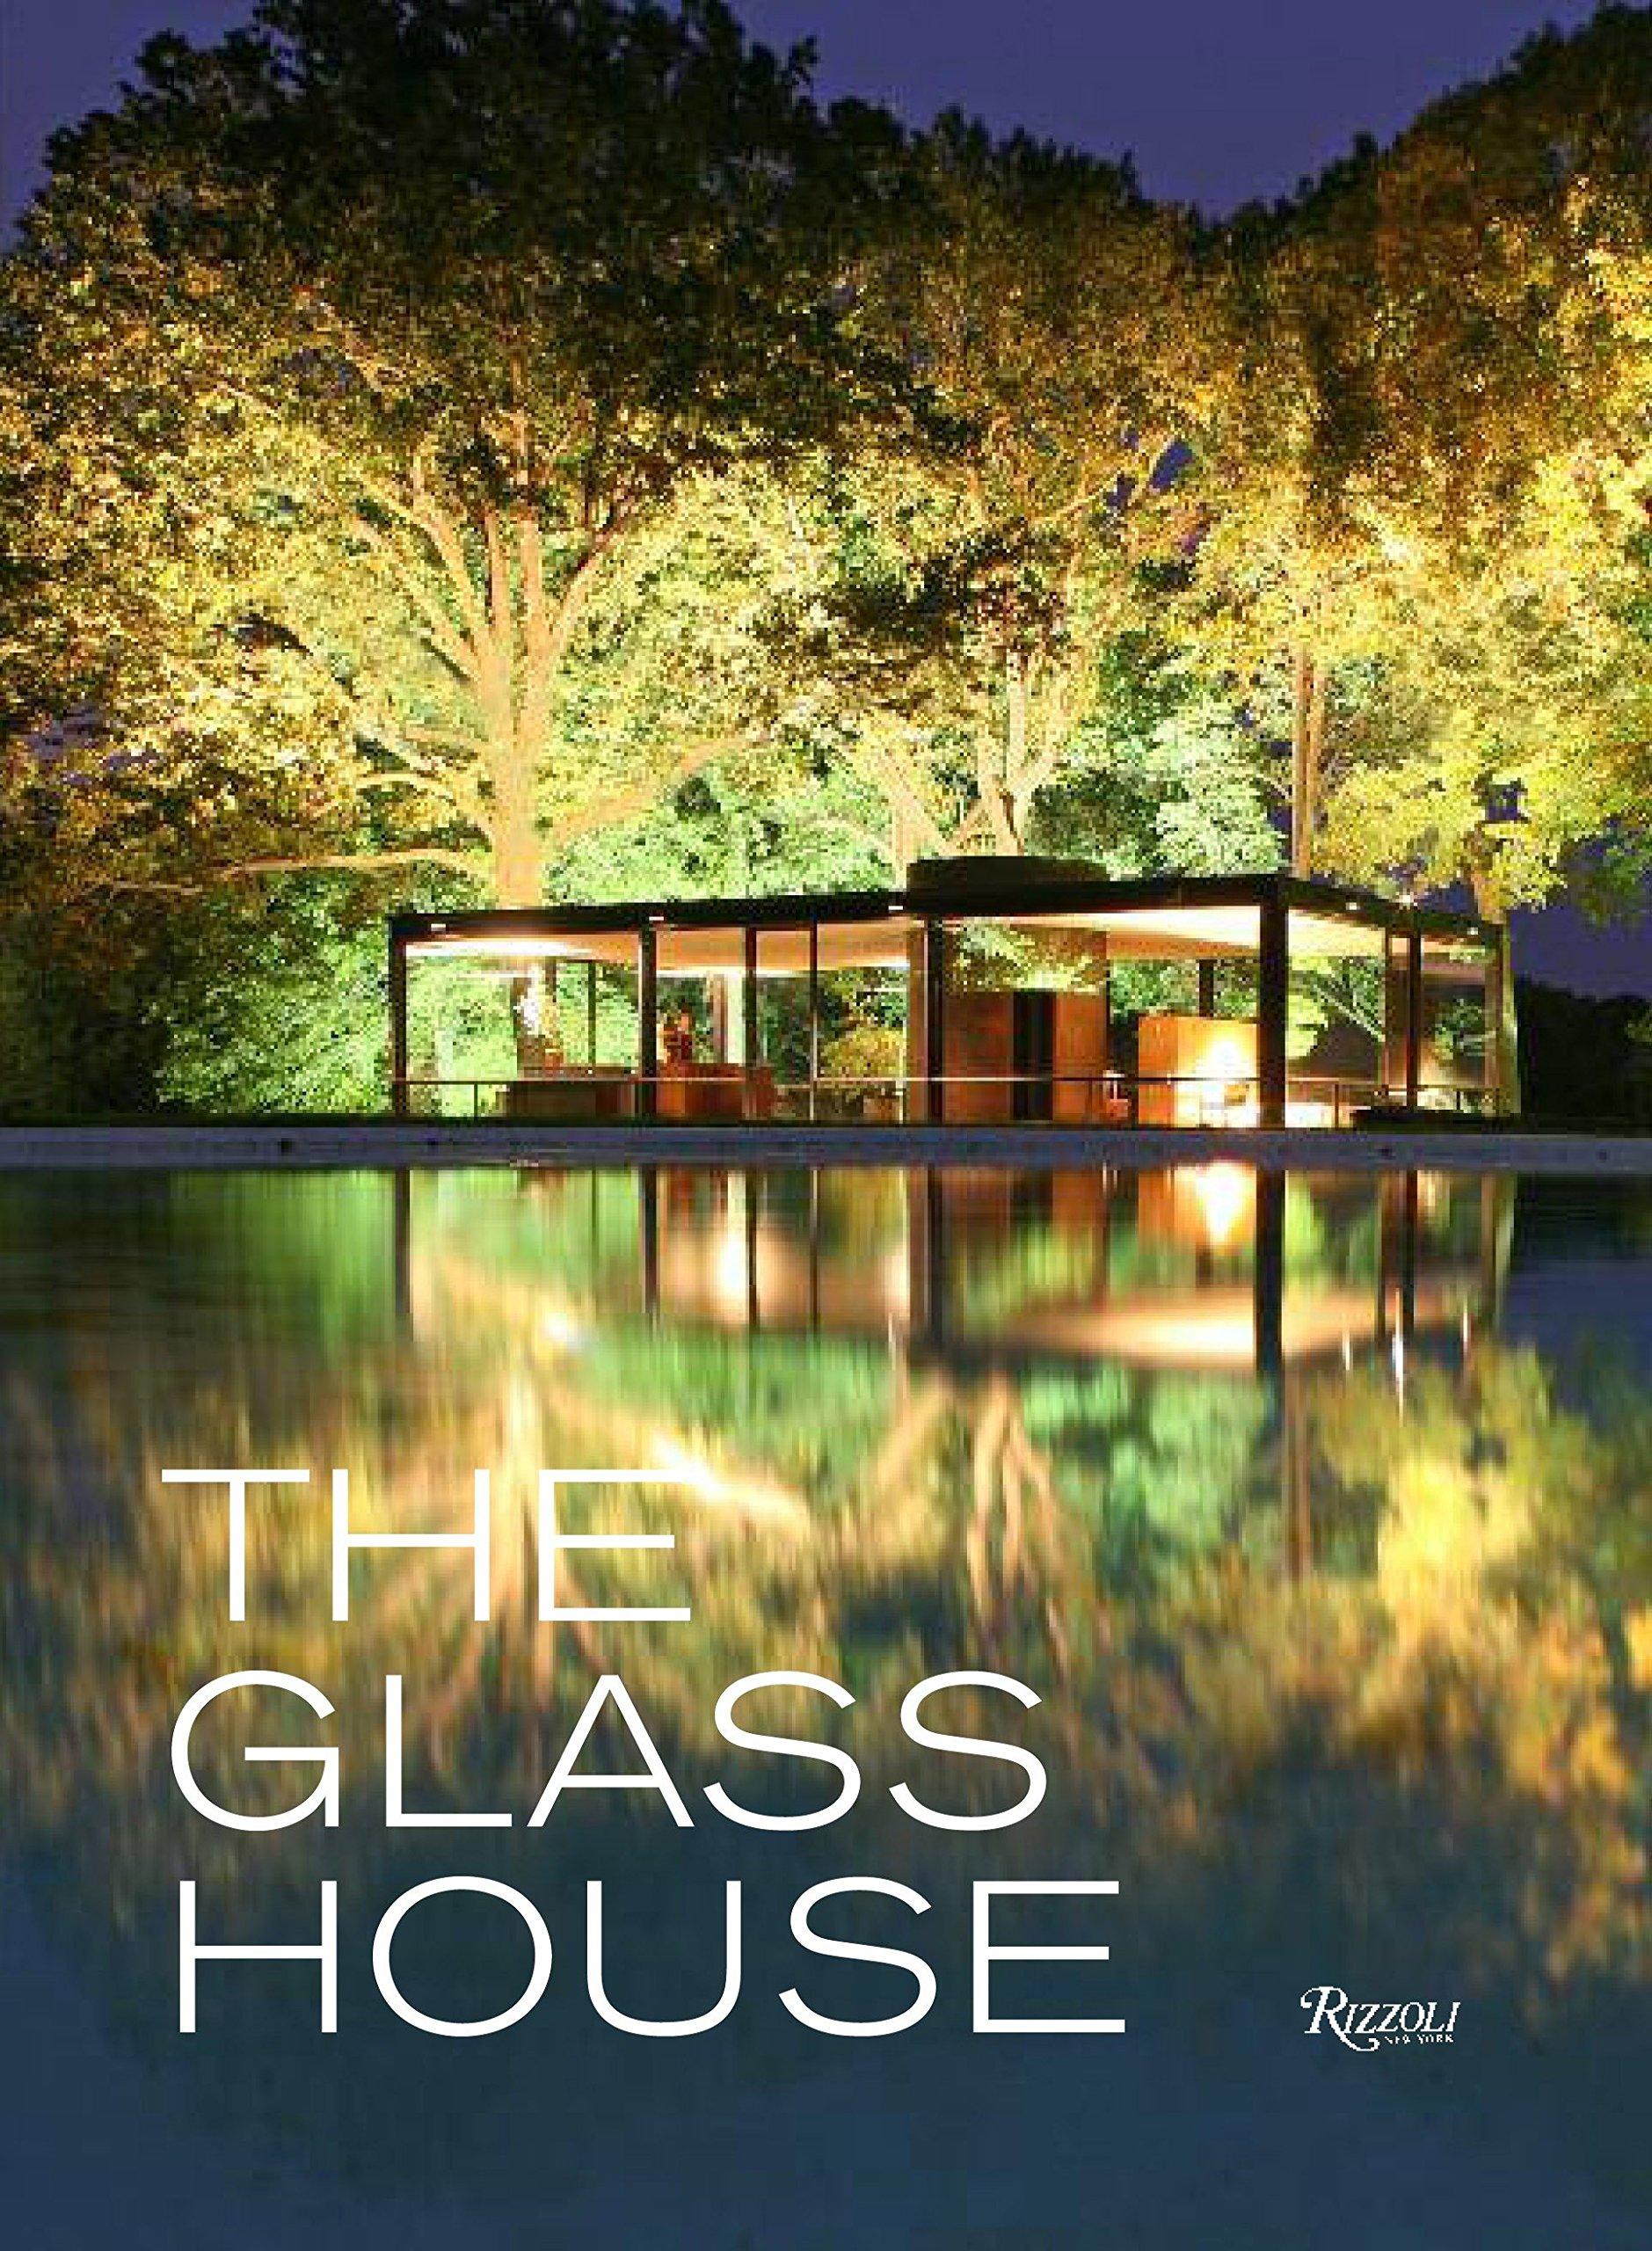 The Glass House Philip Johnson Paul Goldberger 9780847838165